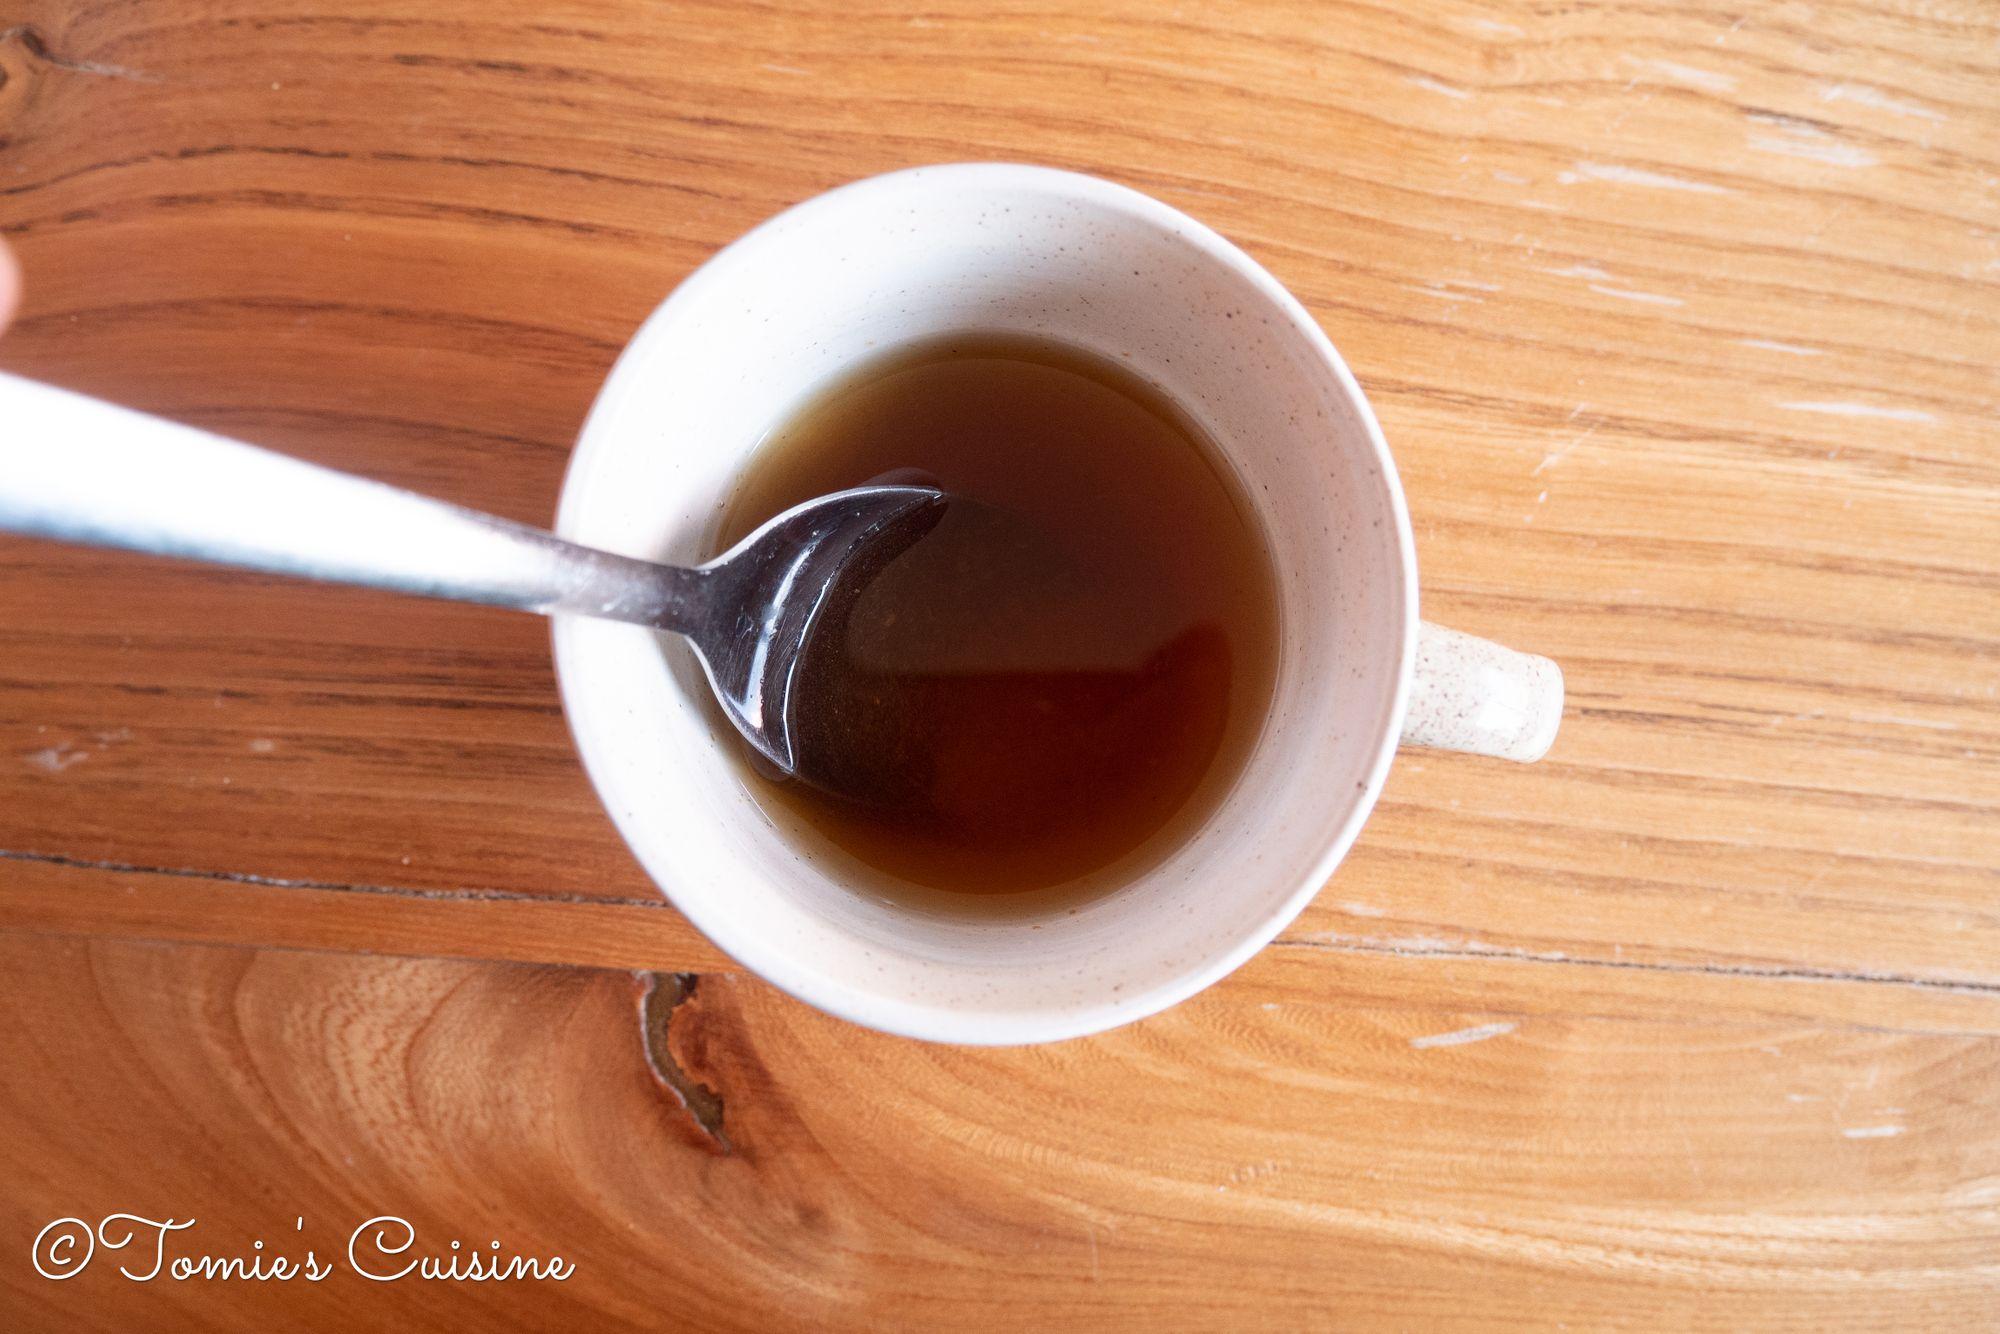 Sushi vinegar. I used brown sugar.